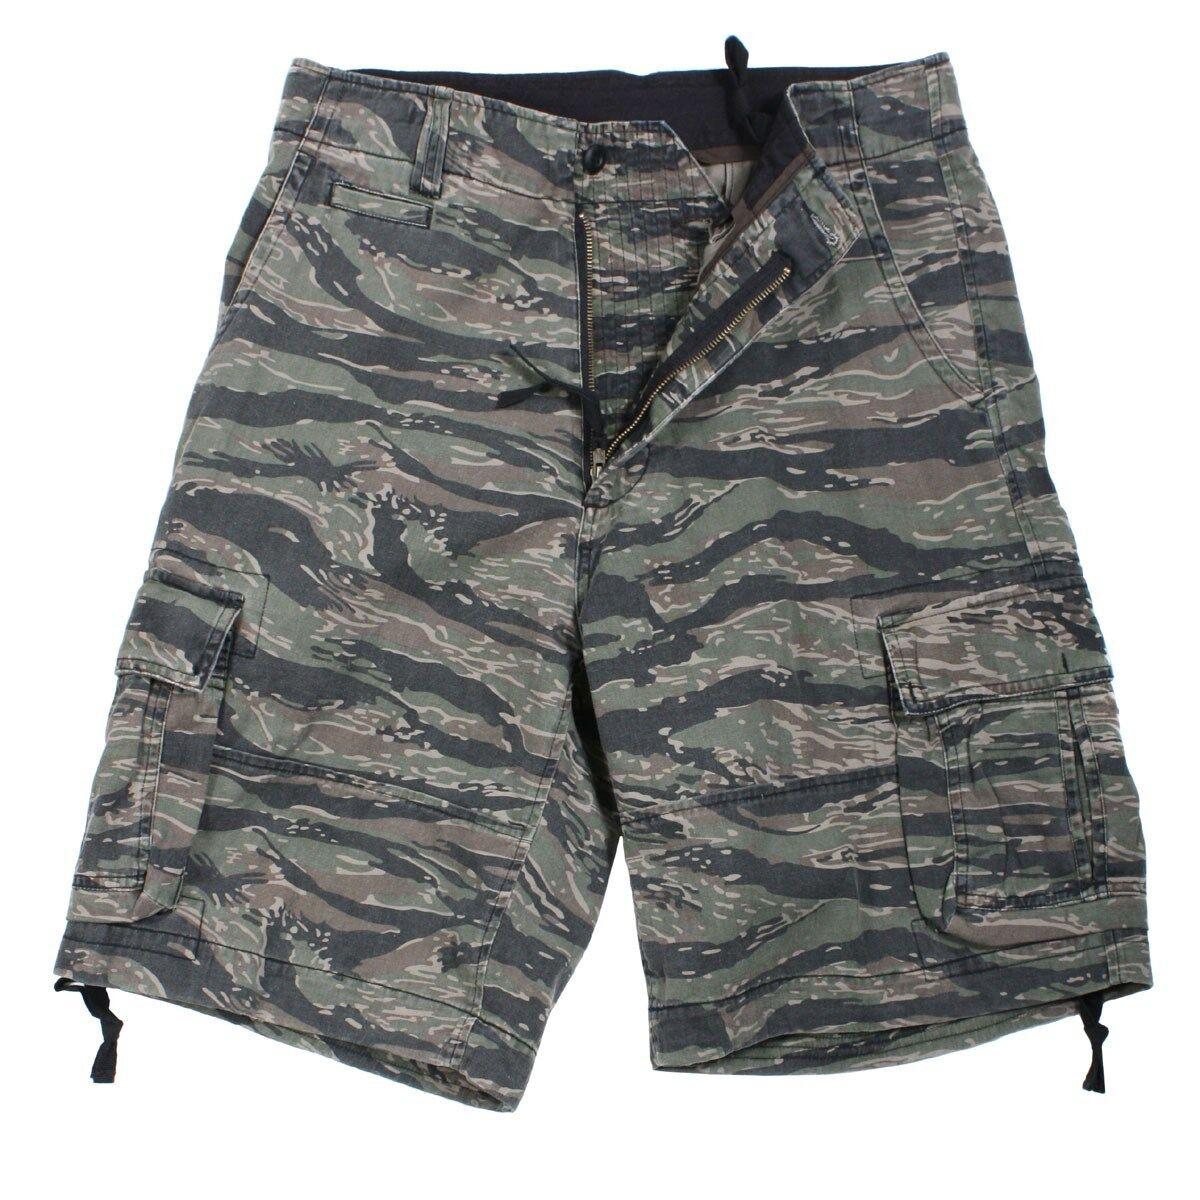 redhco Vintage Camo Infantry Utility Shorts